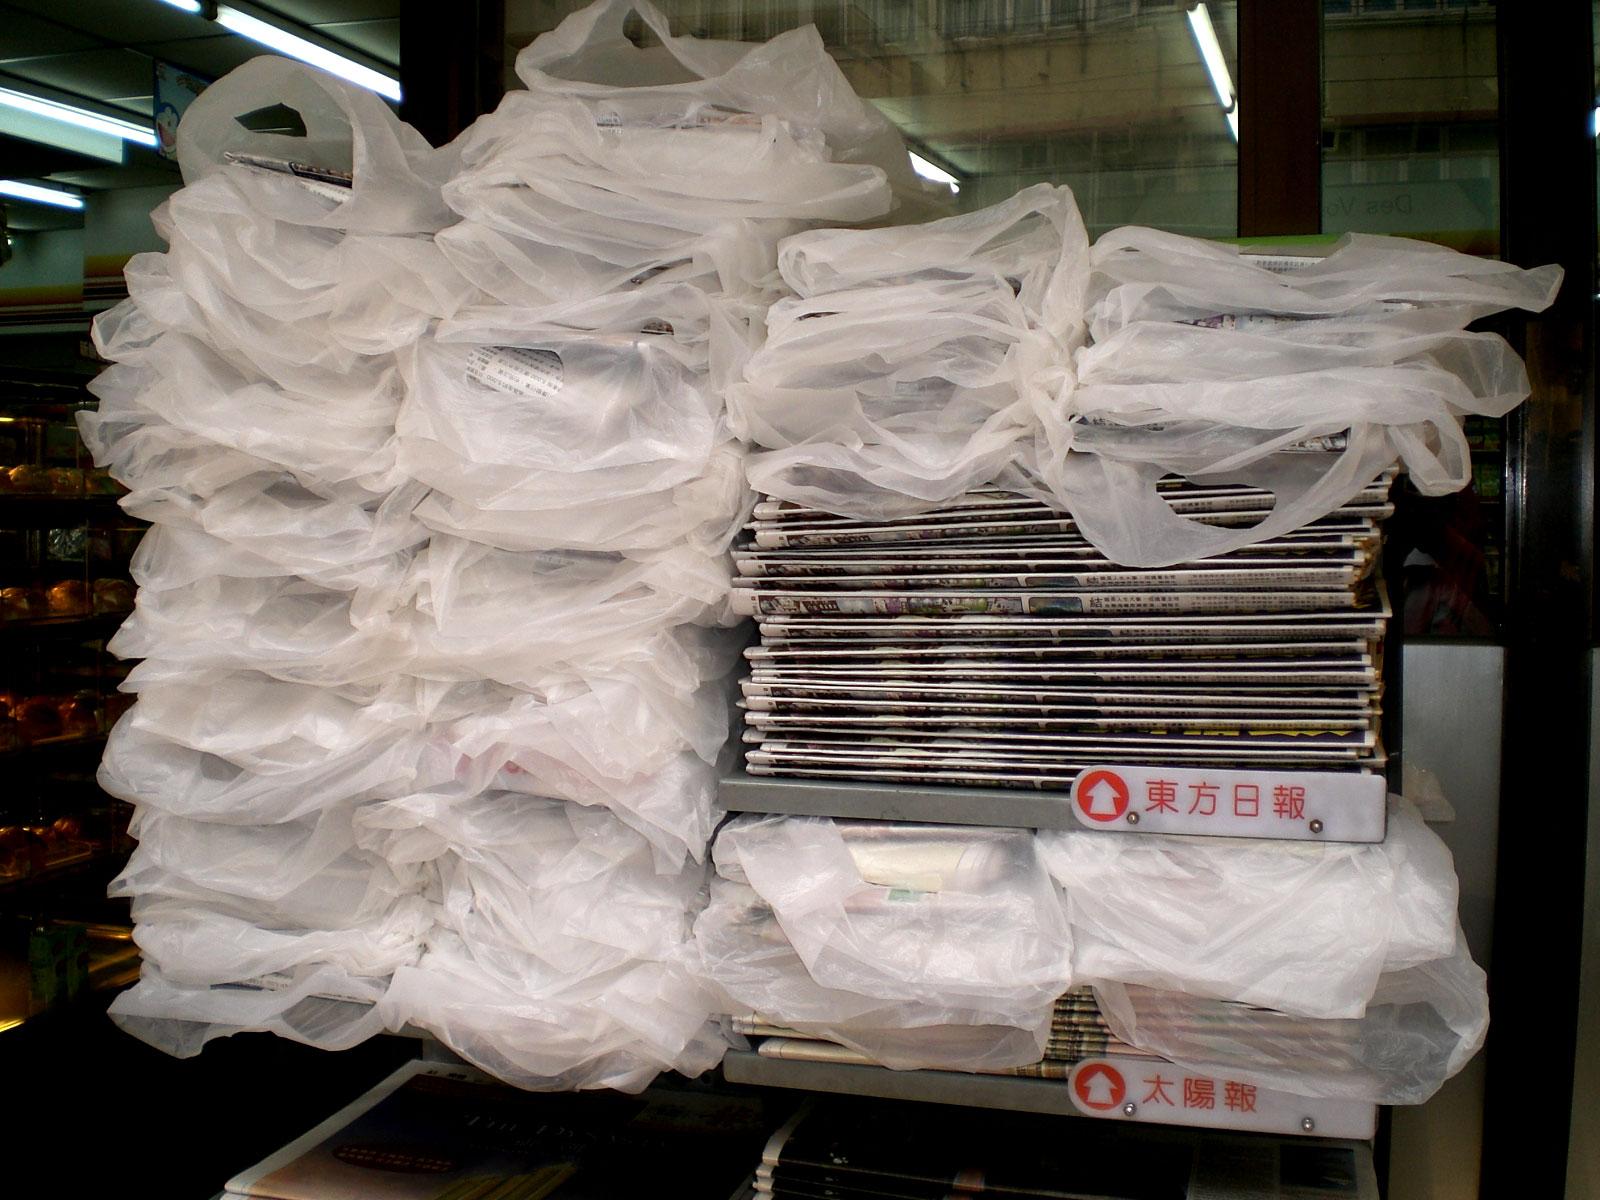 Harm of plastic bags